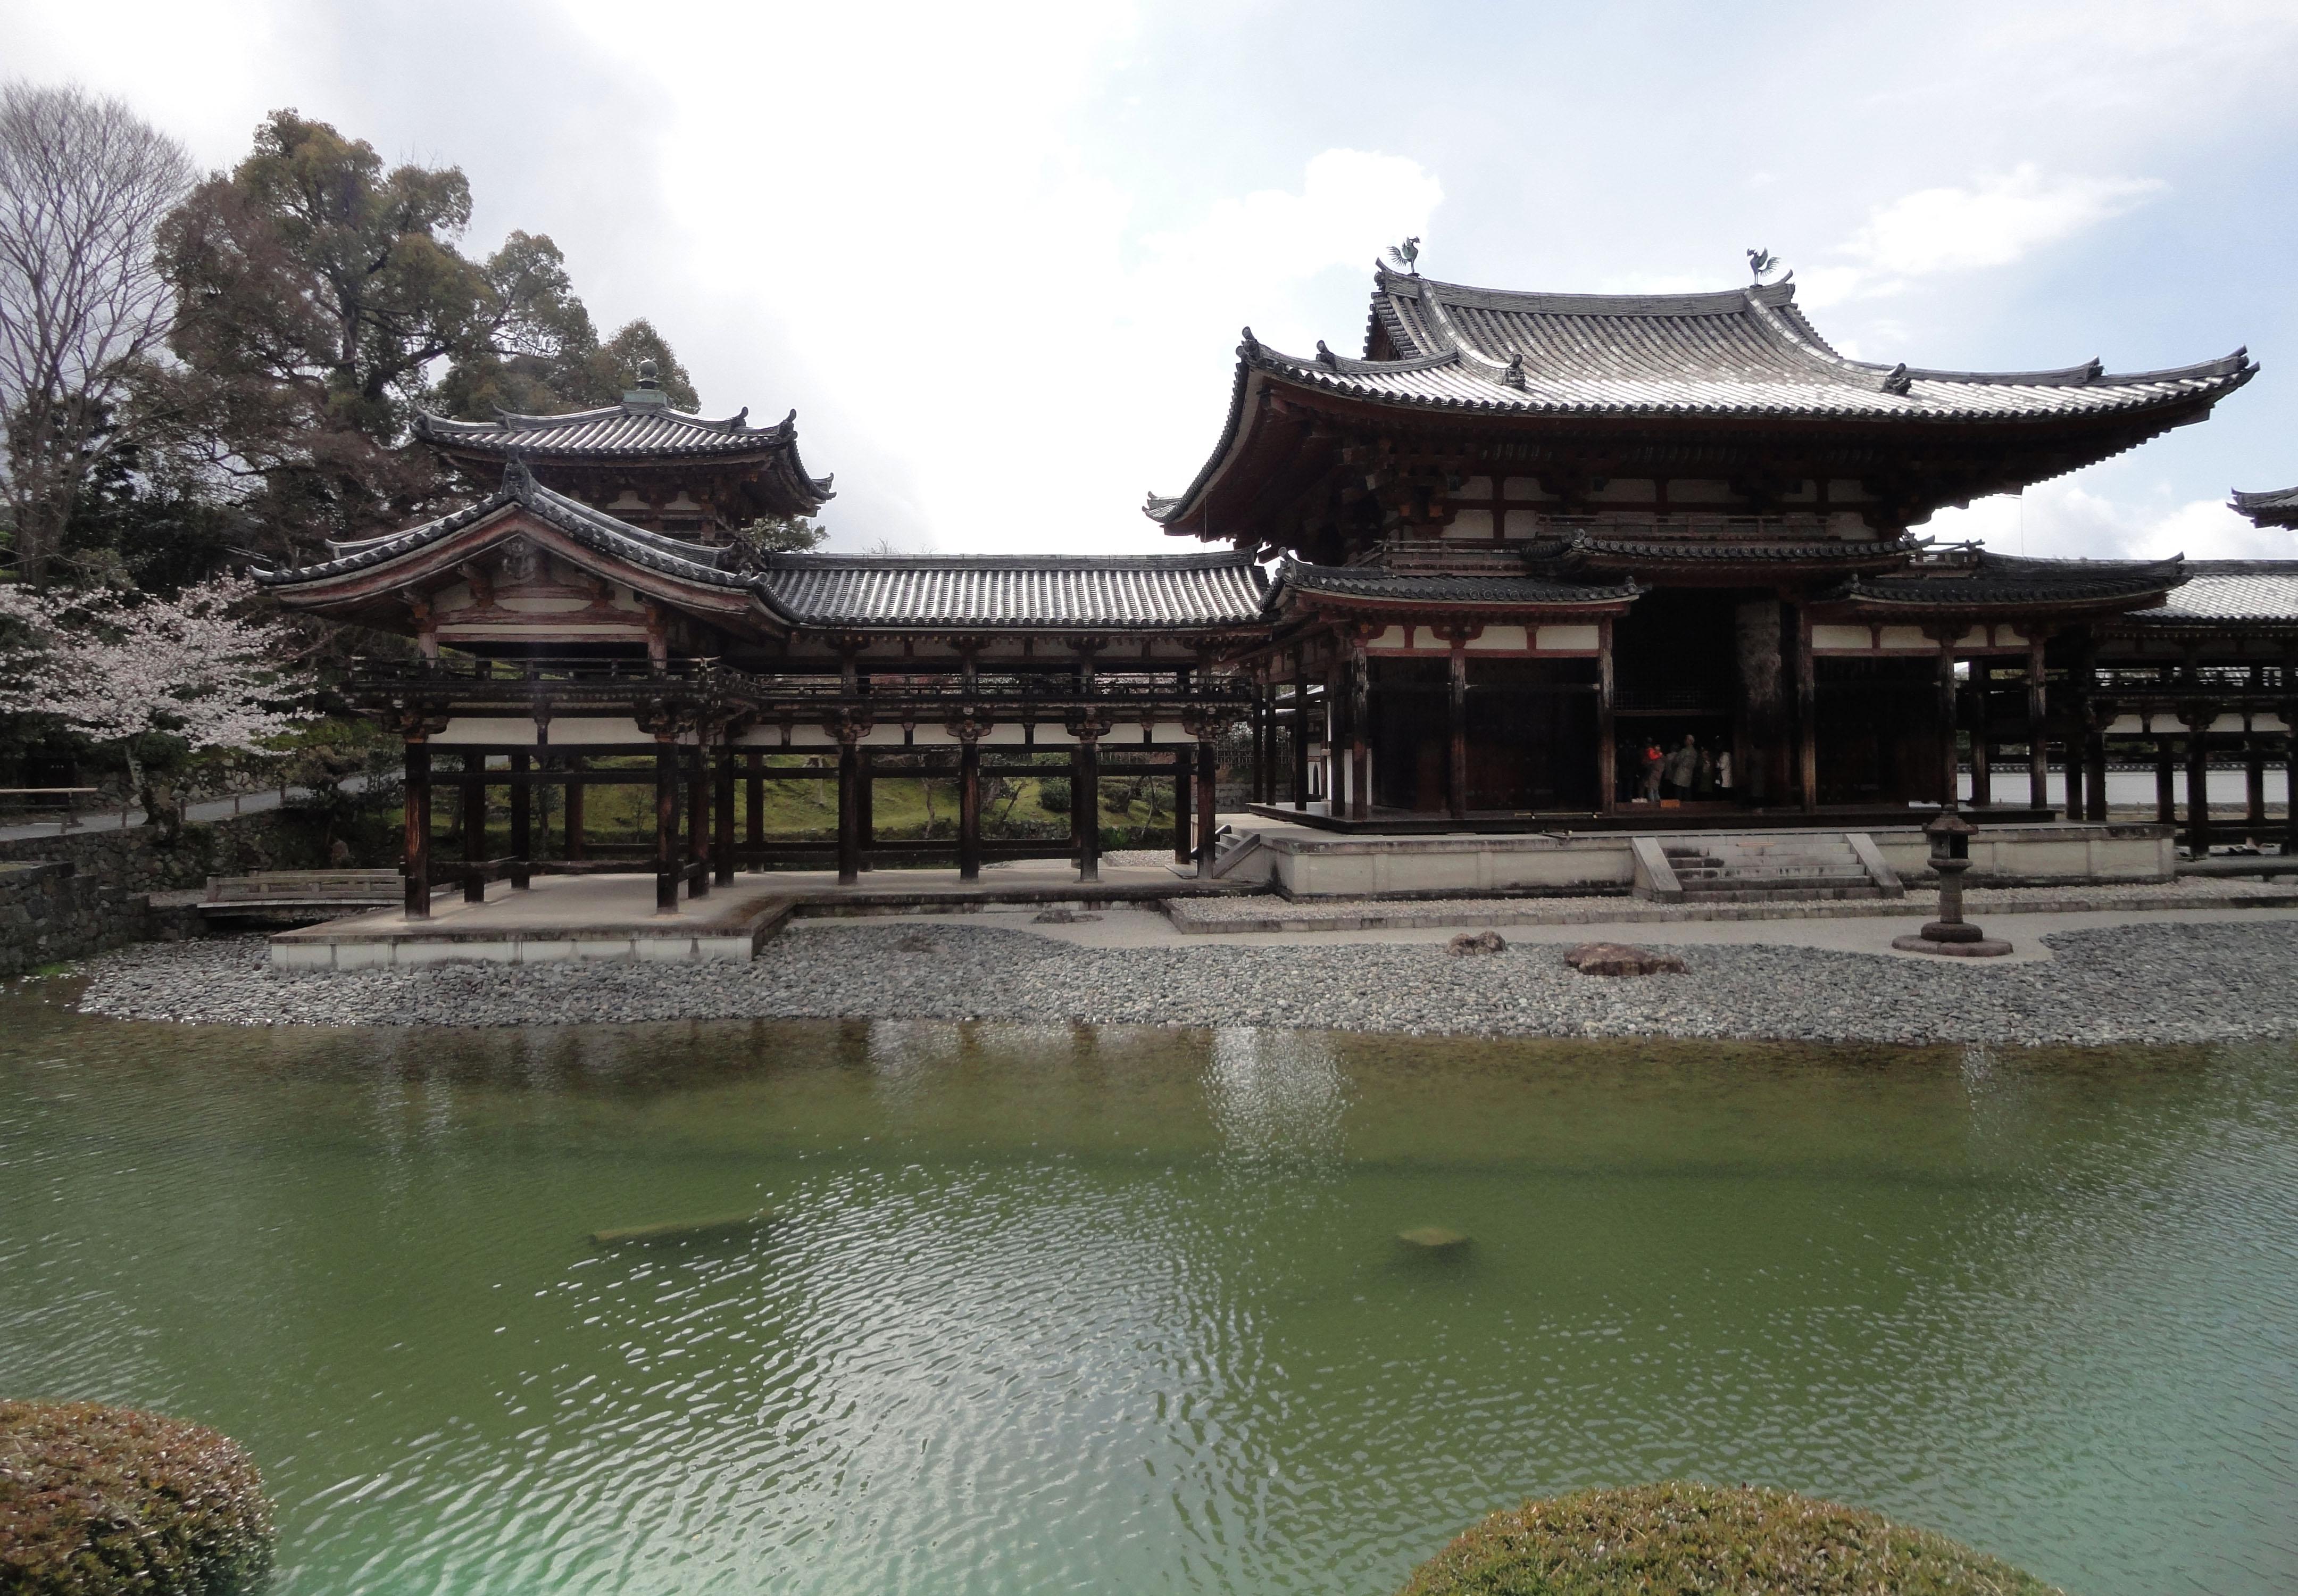 Byodo in temple Phoenix Hall Jodo shiki garden pond views Japan 02